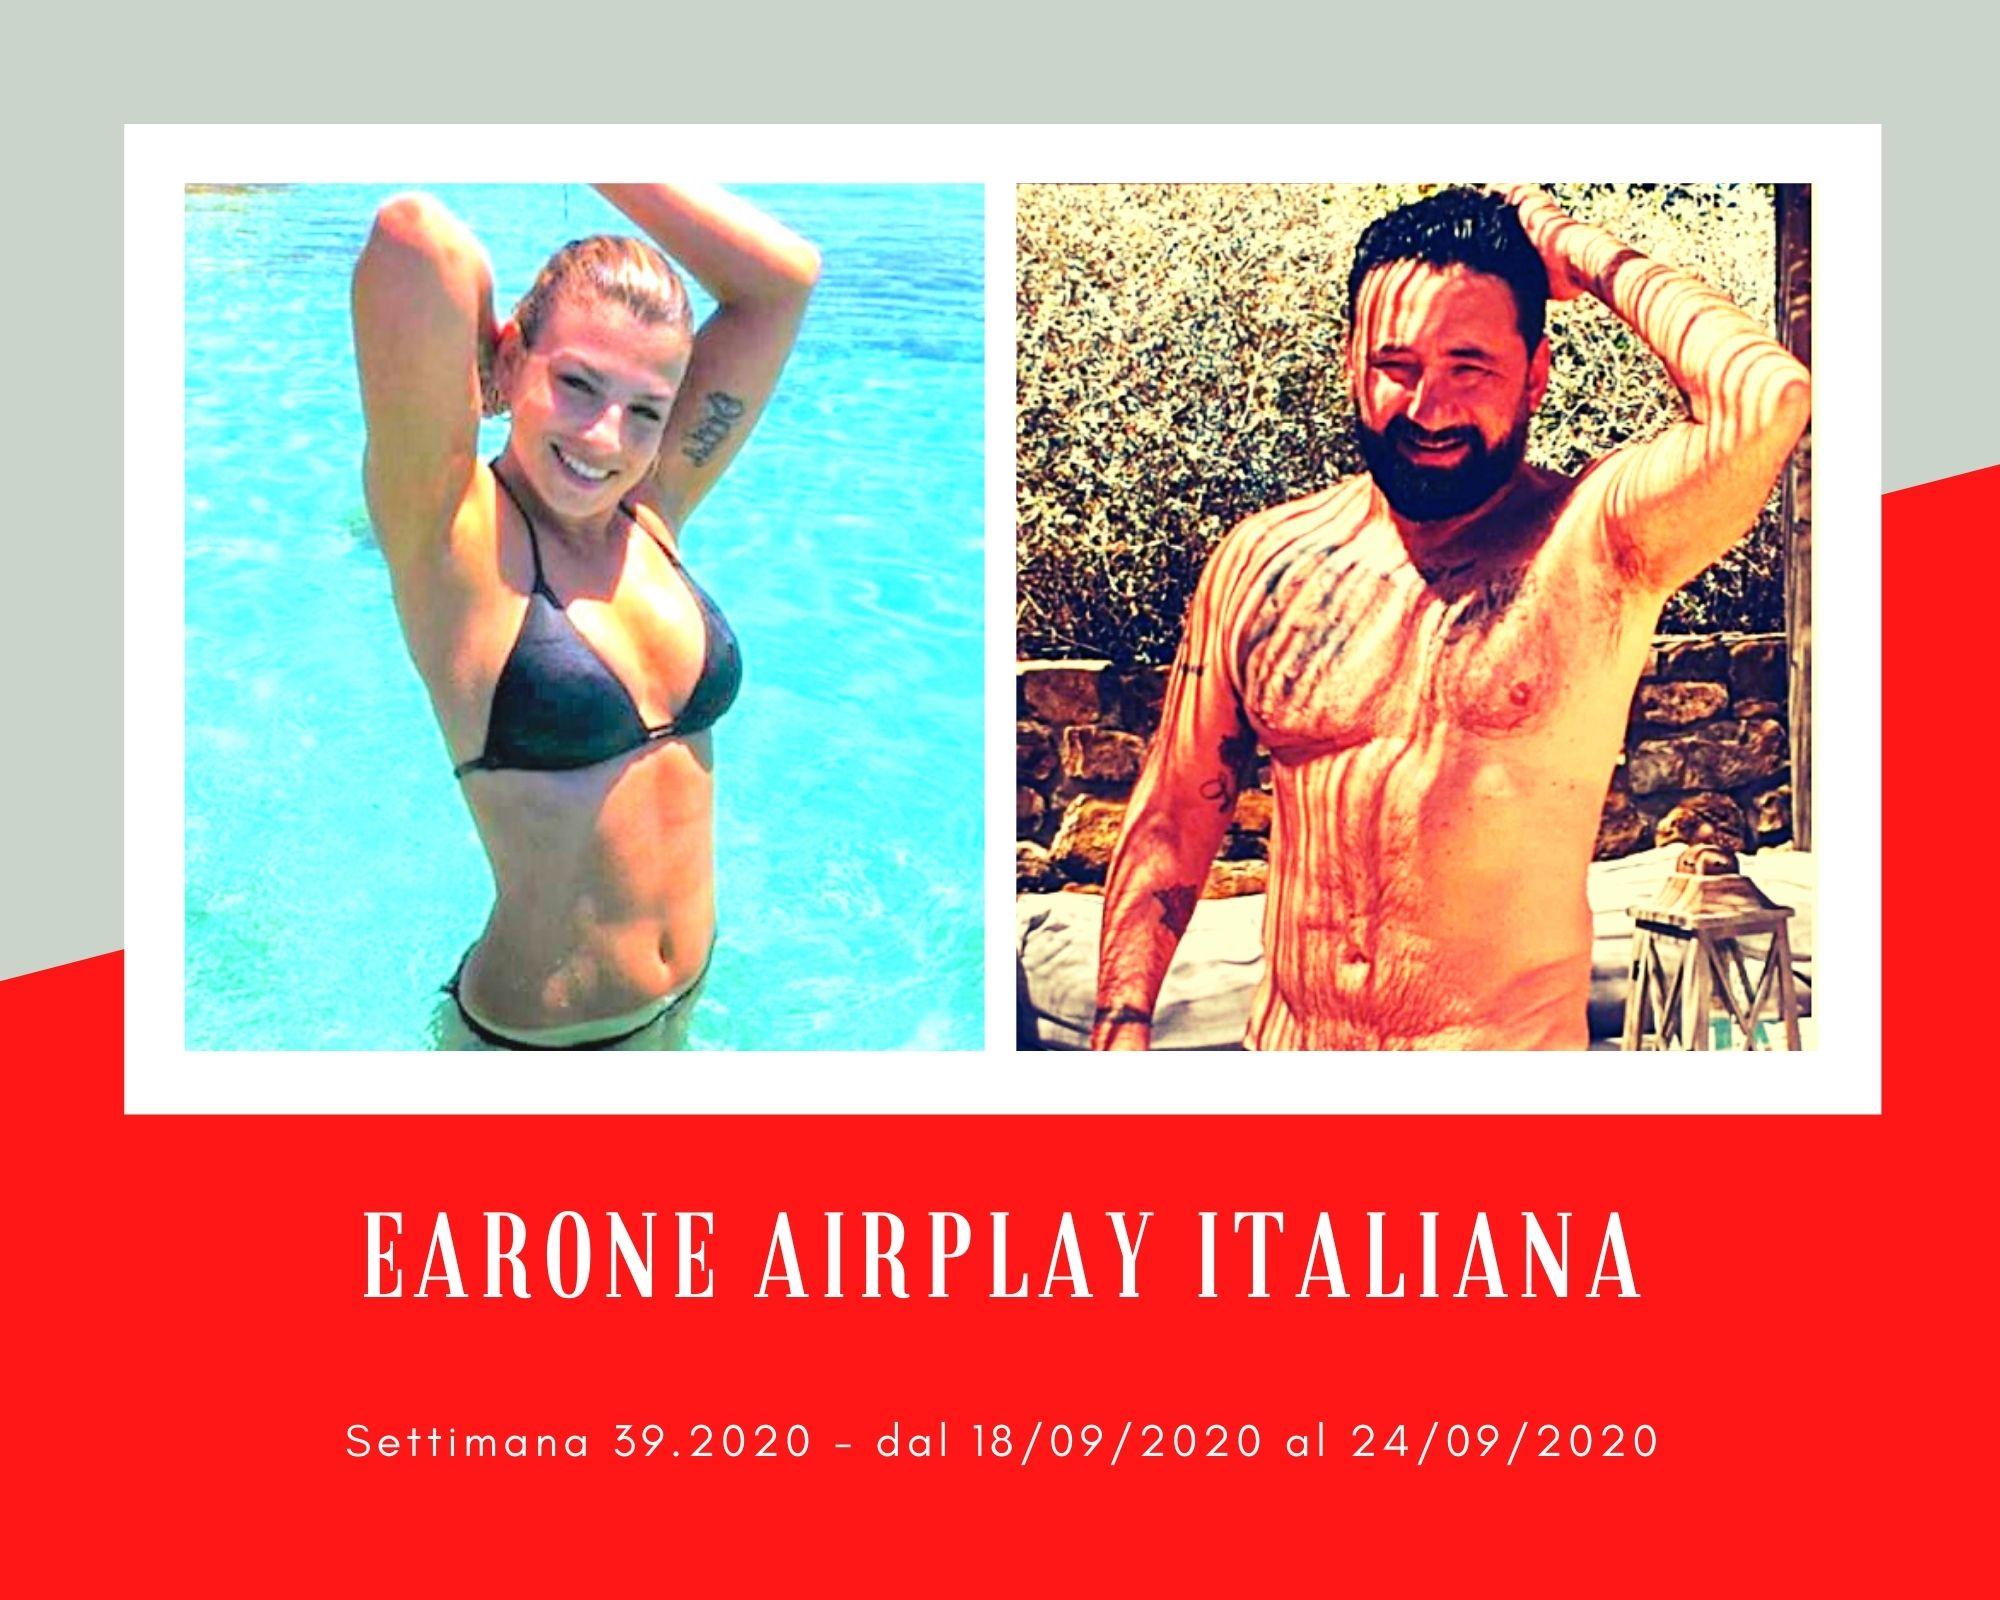 Classifica Radio EarOne Airplay Italiana, week 39: Emma regina d'autunno. Avanza Tiromancino, resistono Elodie, Anitta, Ana Mena e Alessandra Amoroso